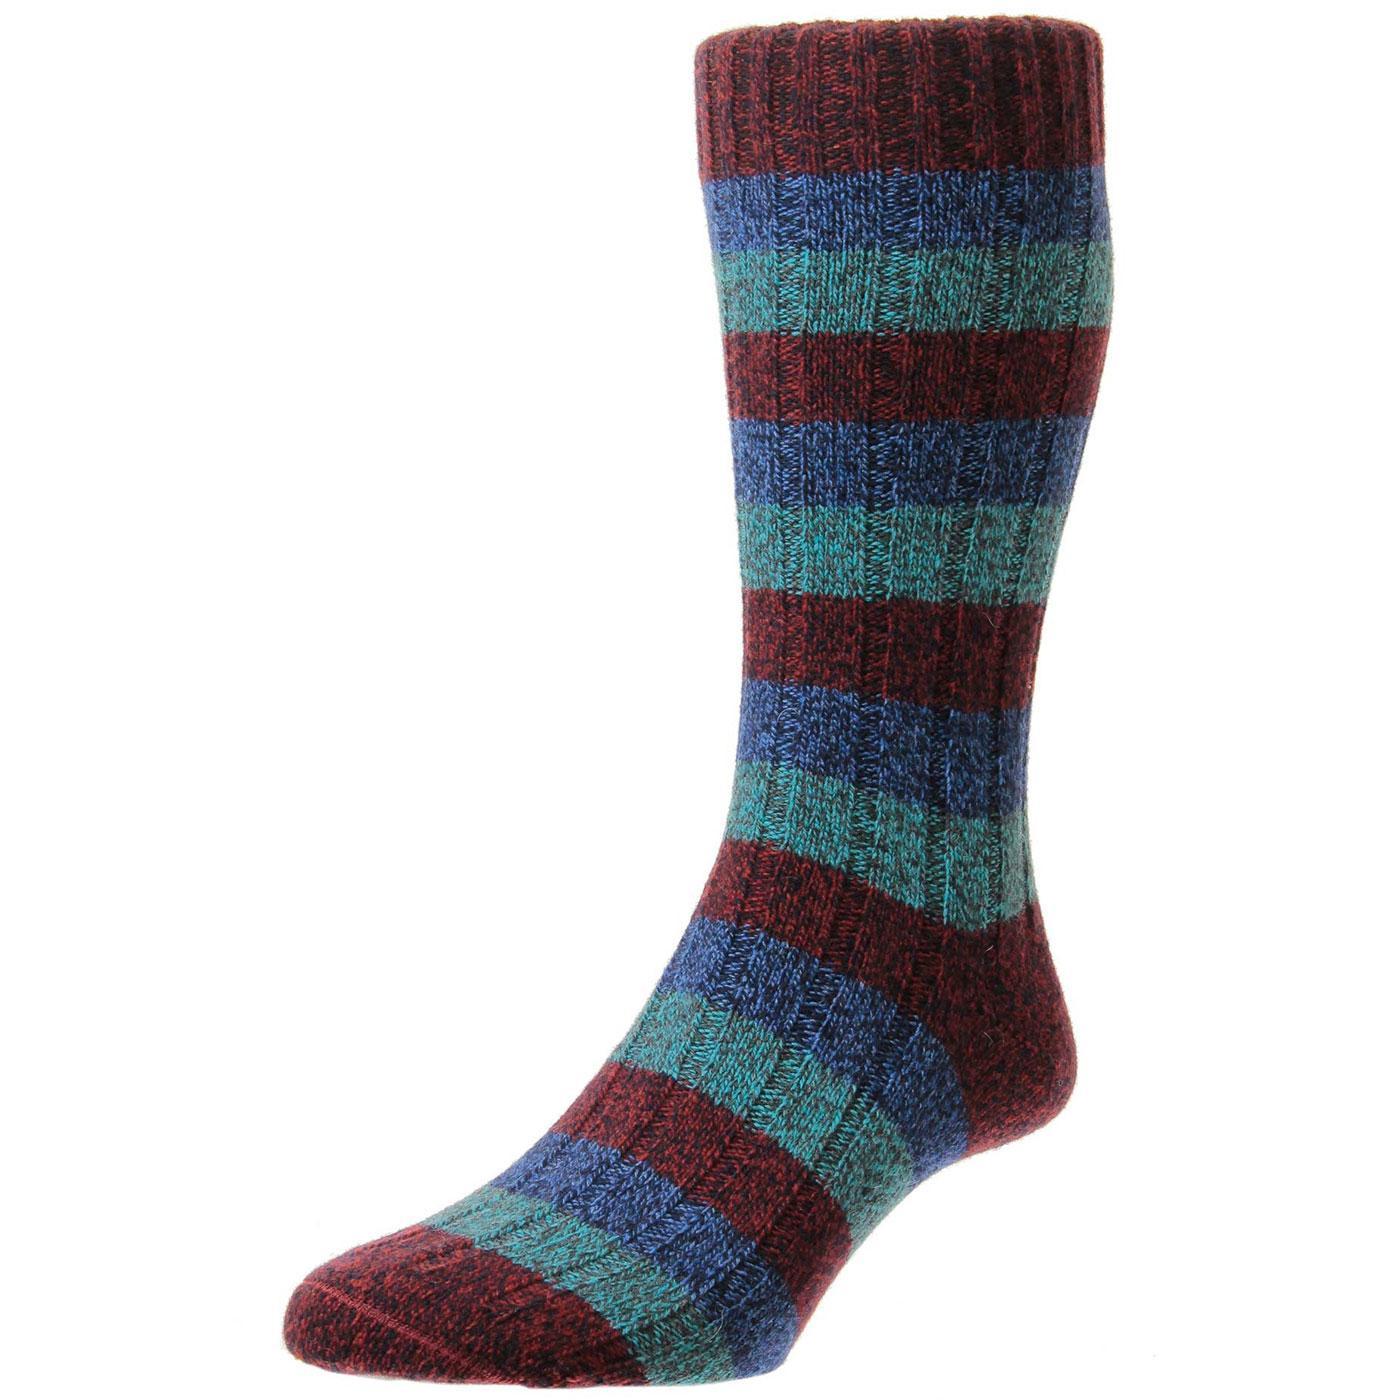 + Riddlesden SCOTT-NICHOL Mens Chunky Knit Socks C